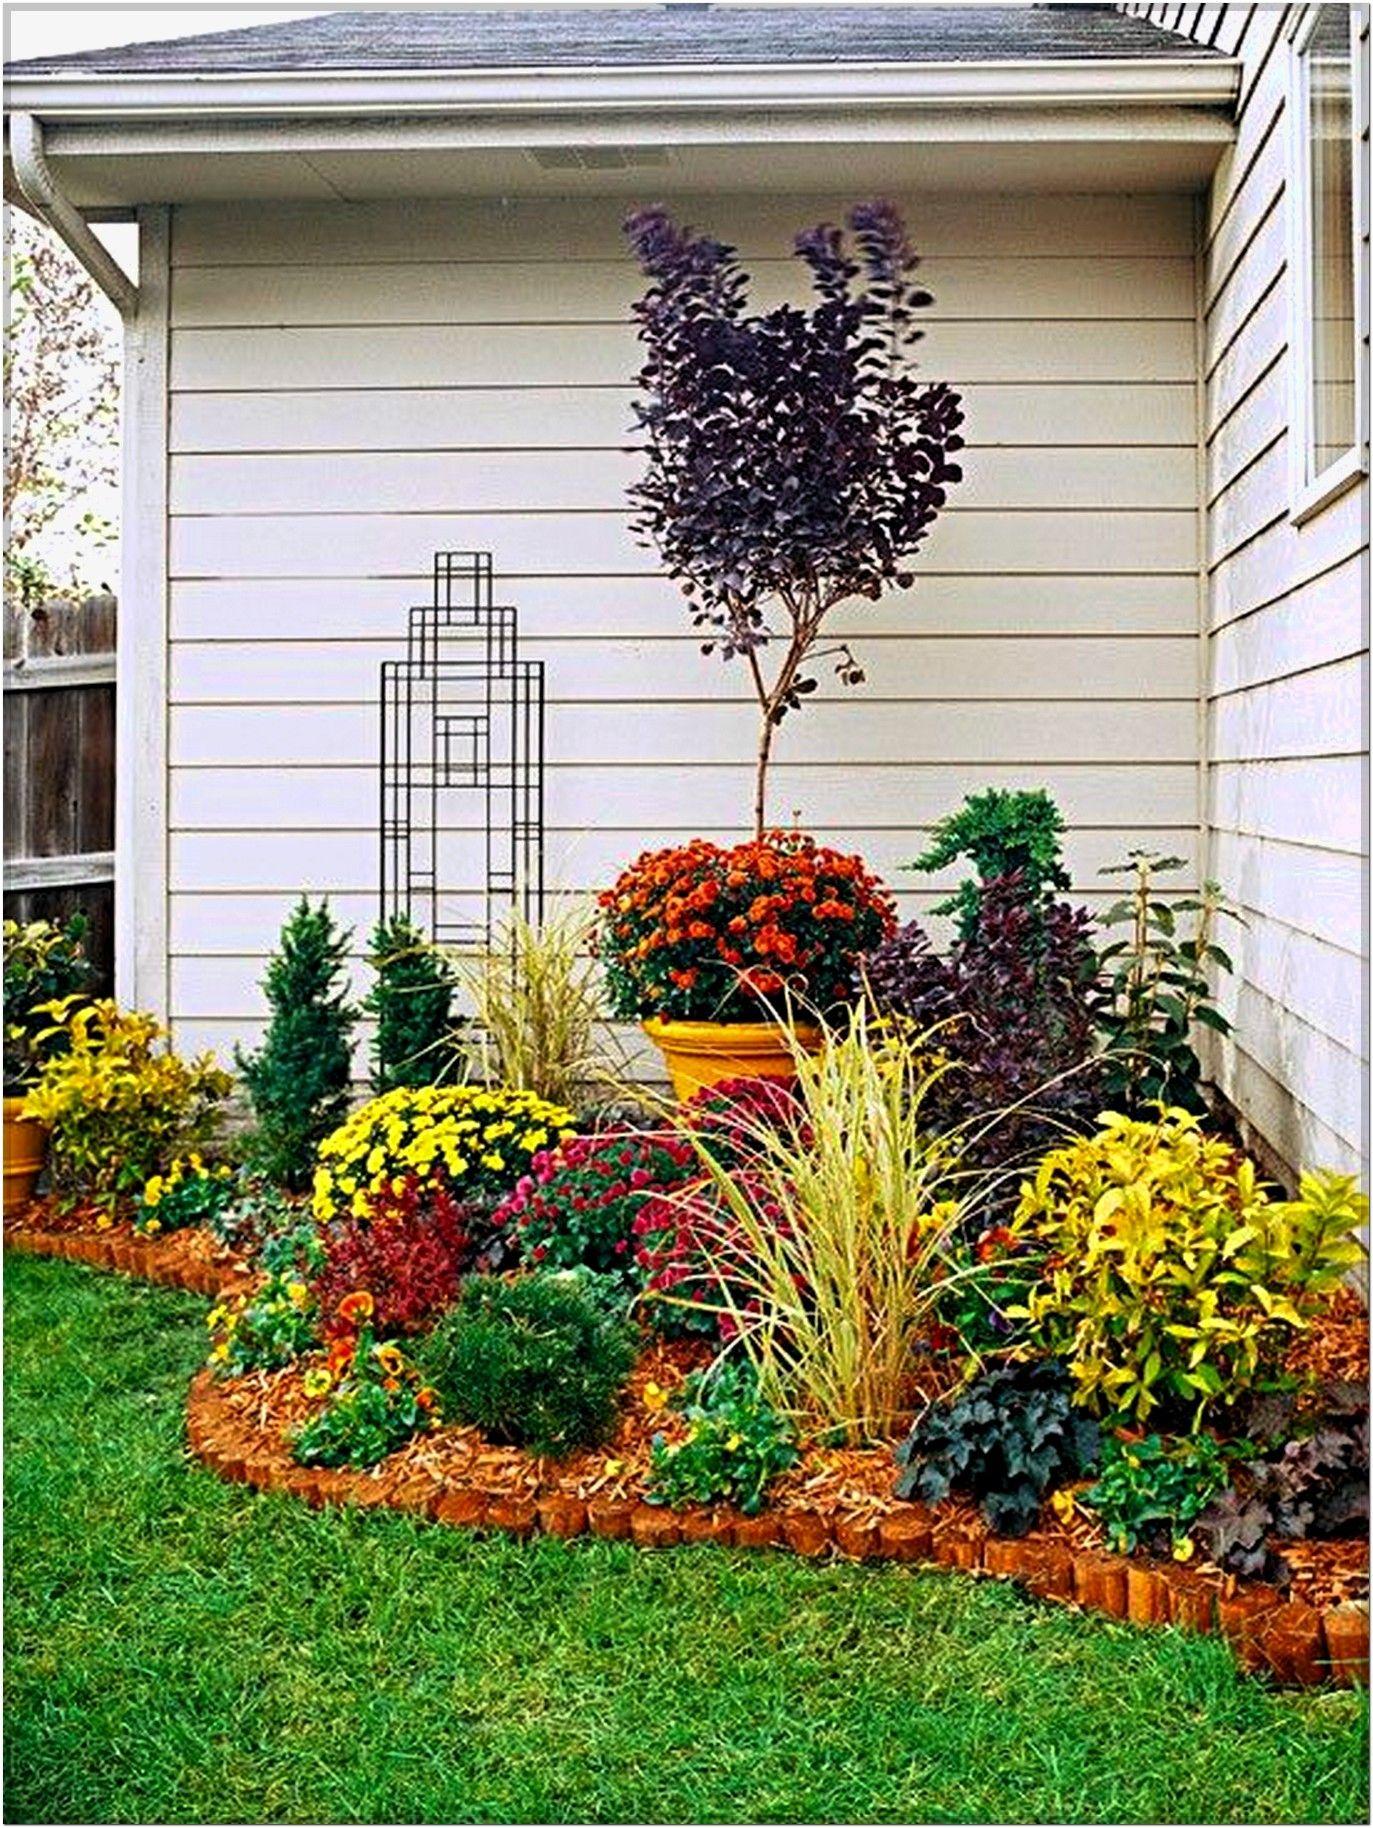 Small Corner Garden Design Diy Do It Yourself On A Budget Garden Design In Alongside Backyard Or Home Best Exterior Home Decorating Small Flower Garden